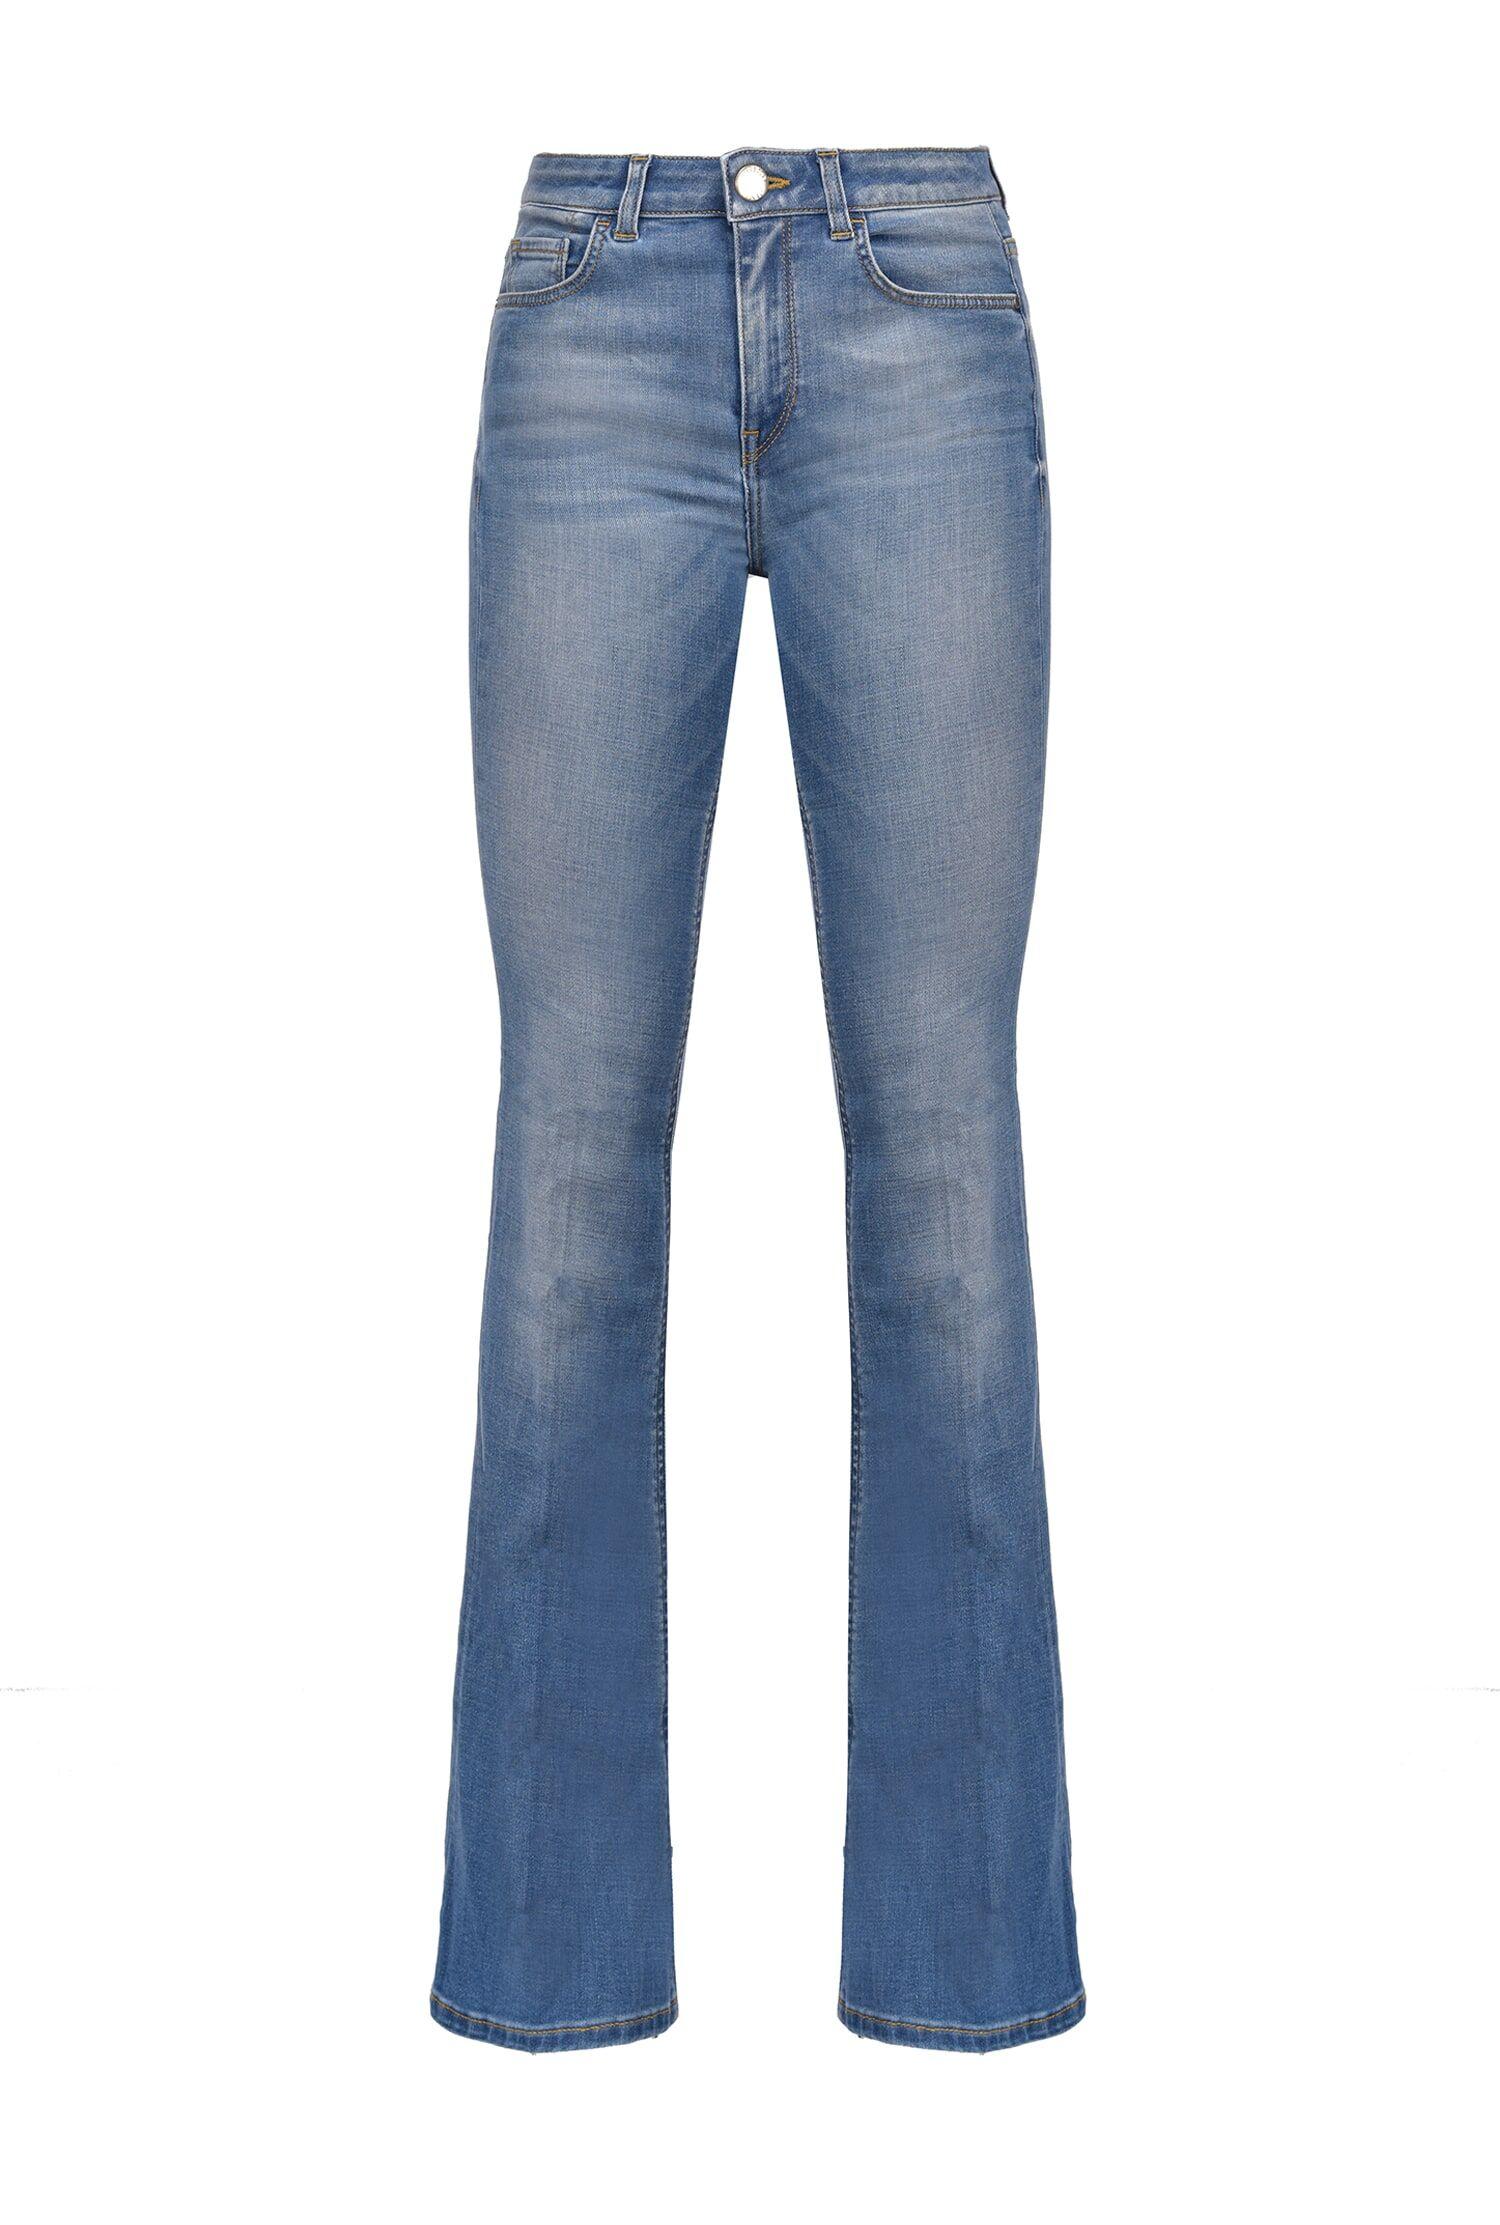 Jeans Flare In Denim Soft - Pinko